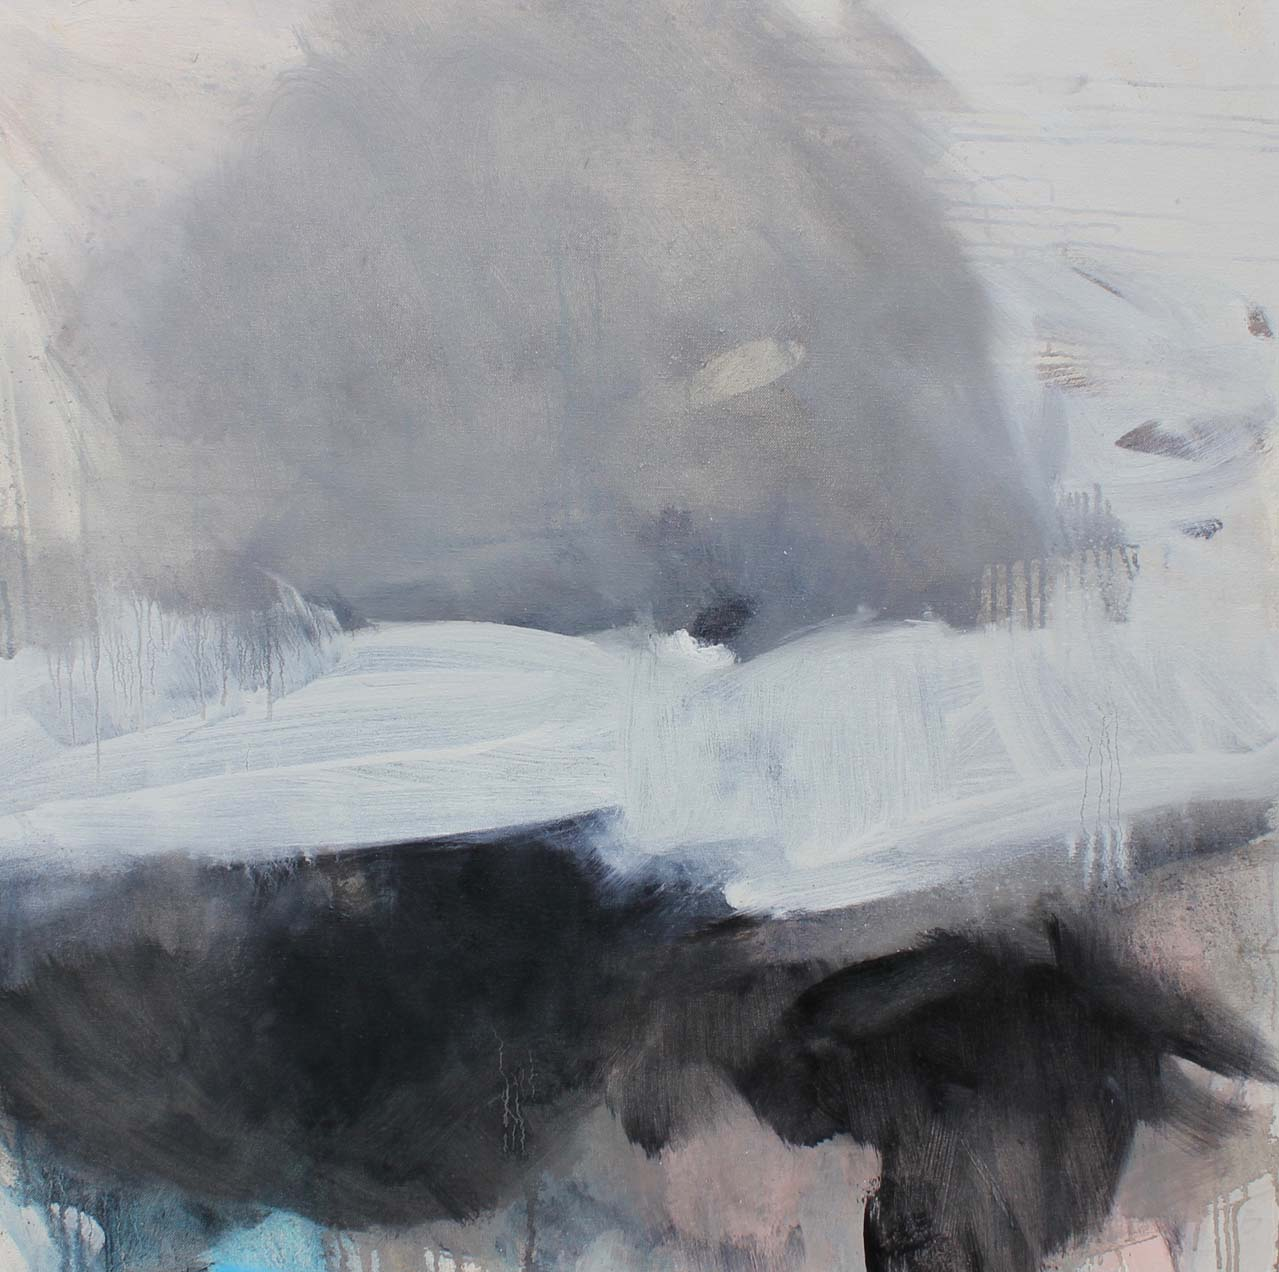 WHEN THE DUST SETTLES II - oil on canvas - 80 x 80cm